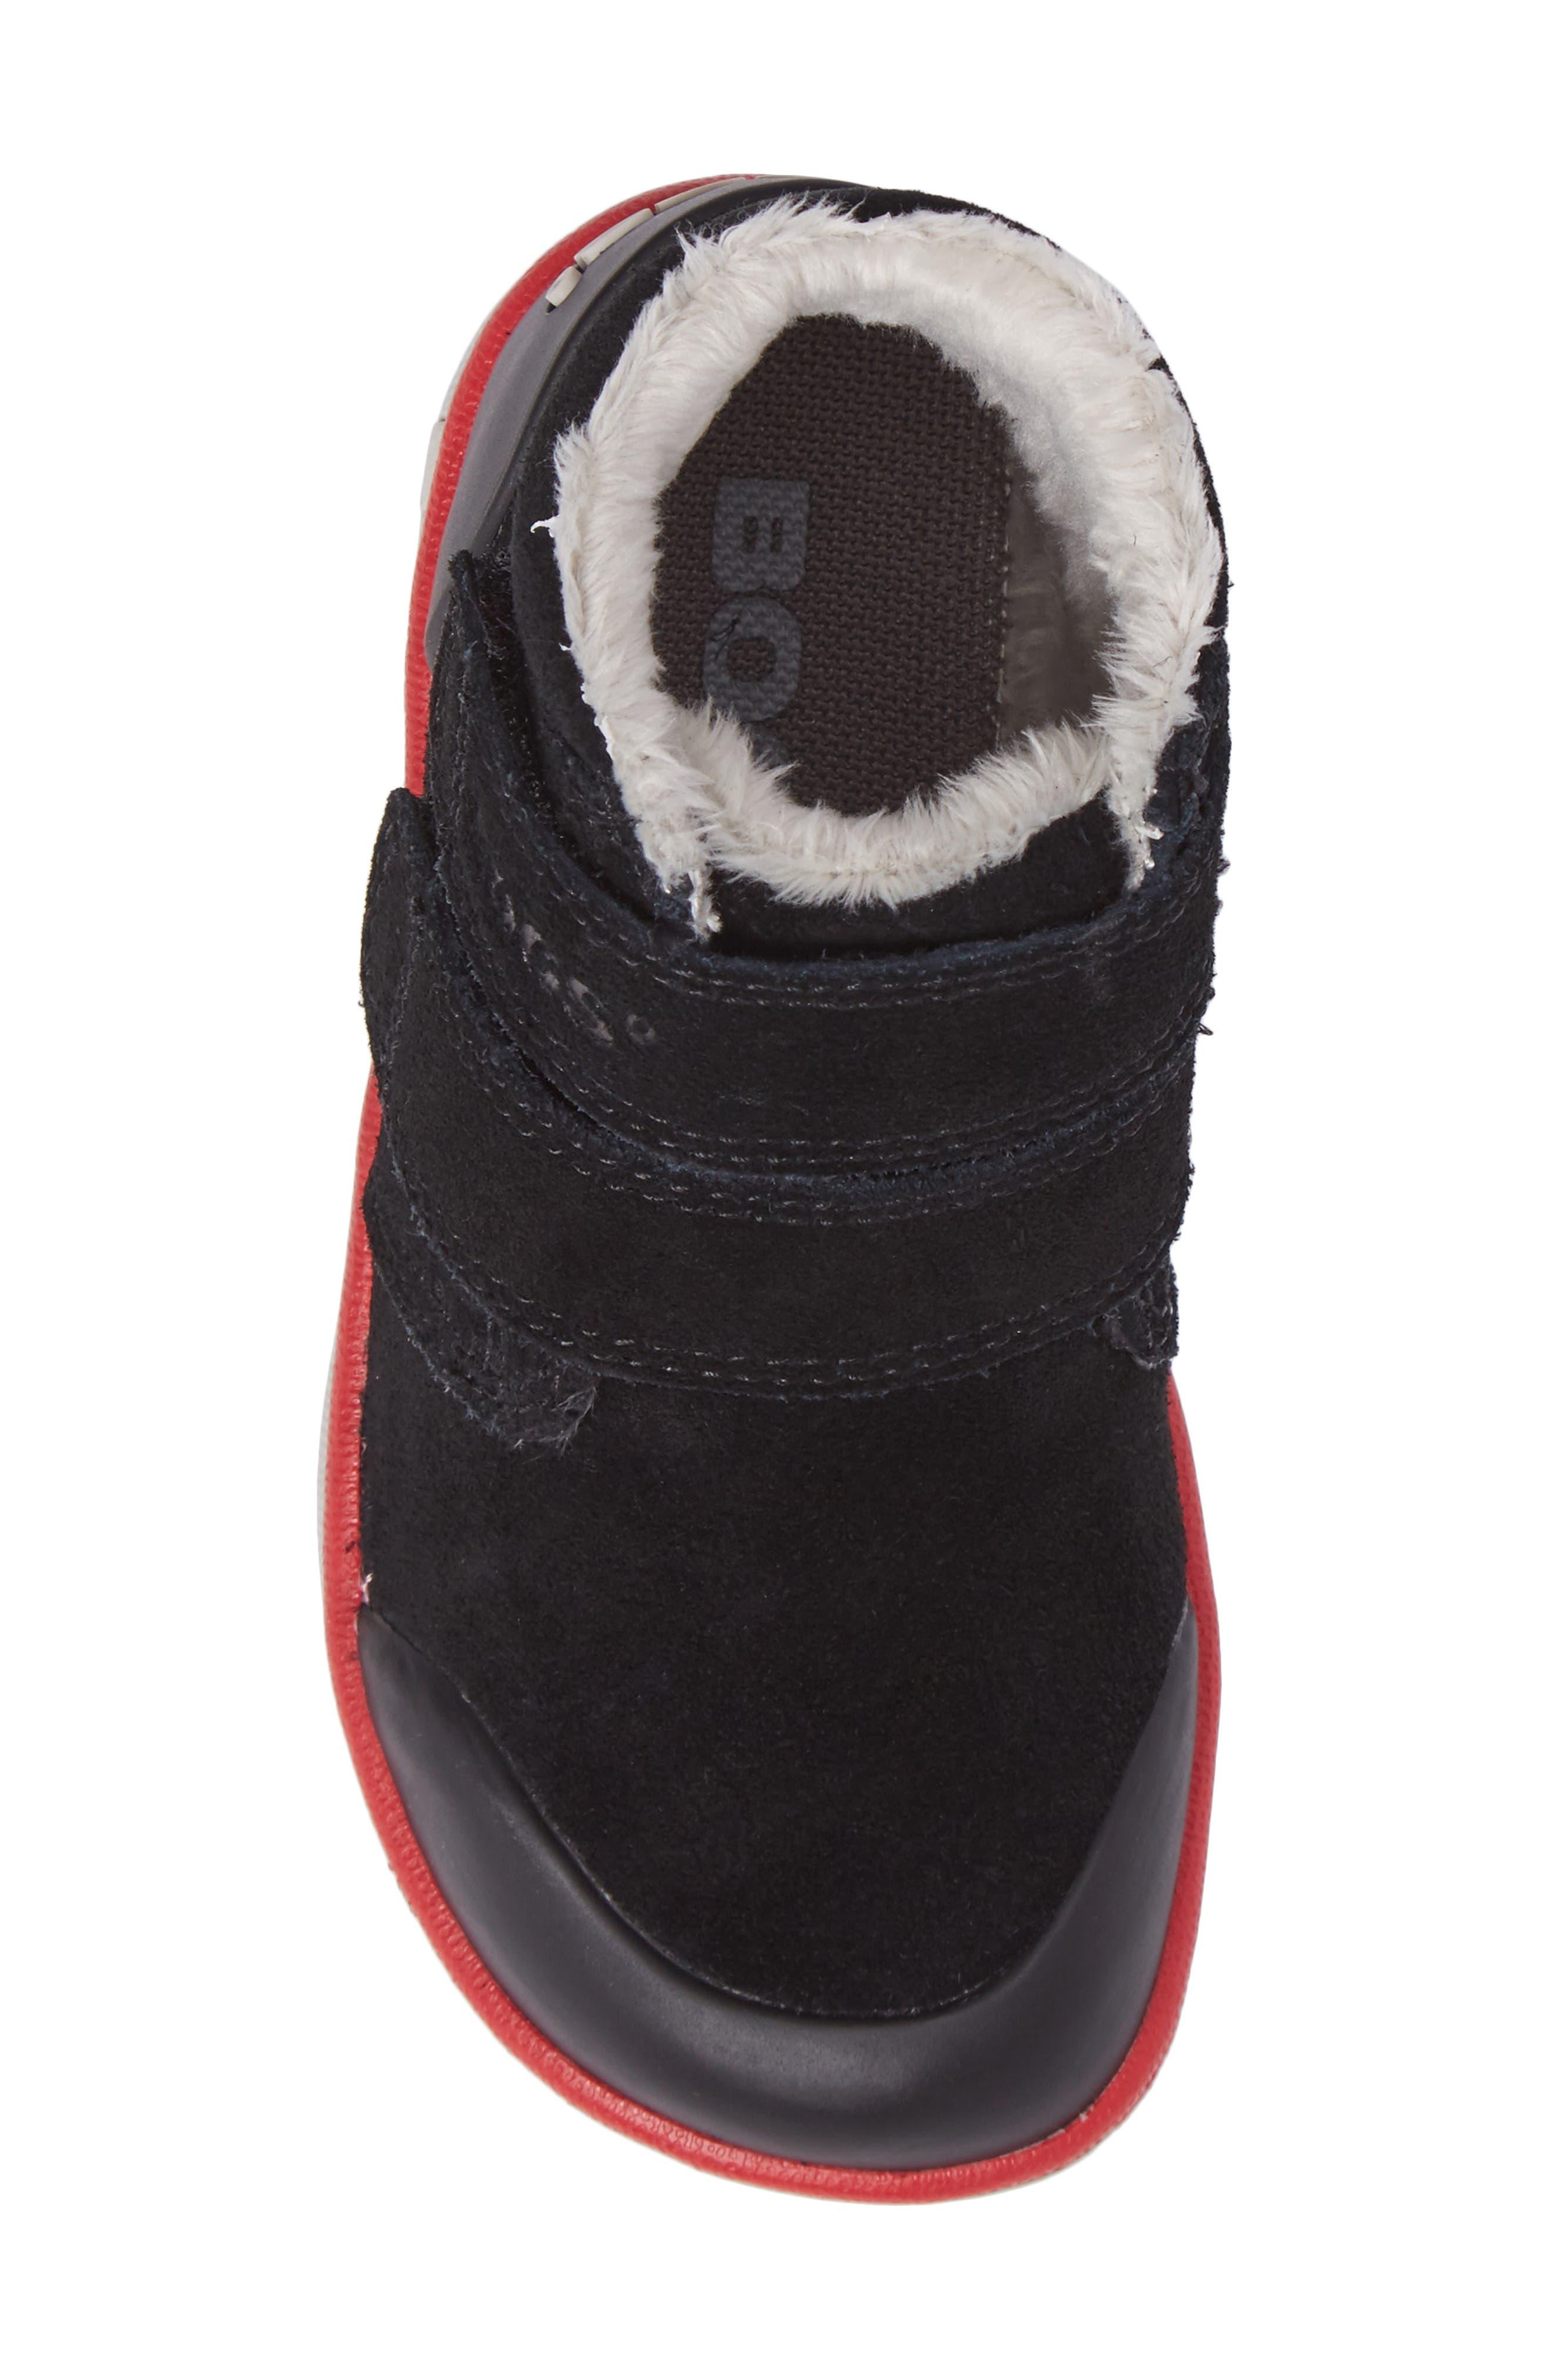 Samantha Faux Fur Waterproof Boot,                             Alternate thumbnail 5, color,                             Black/ Black